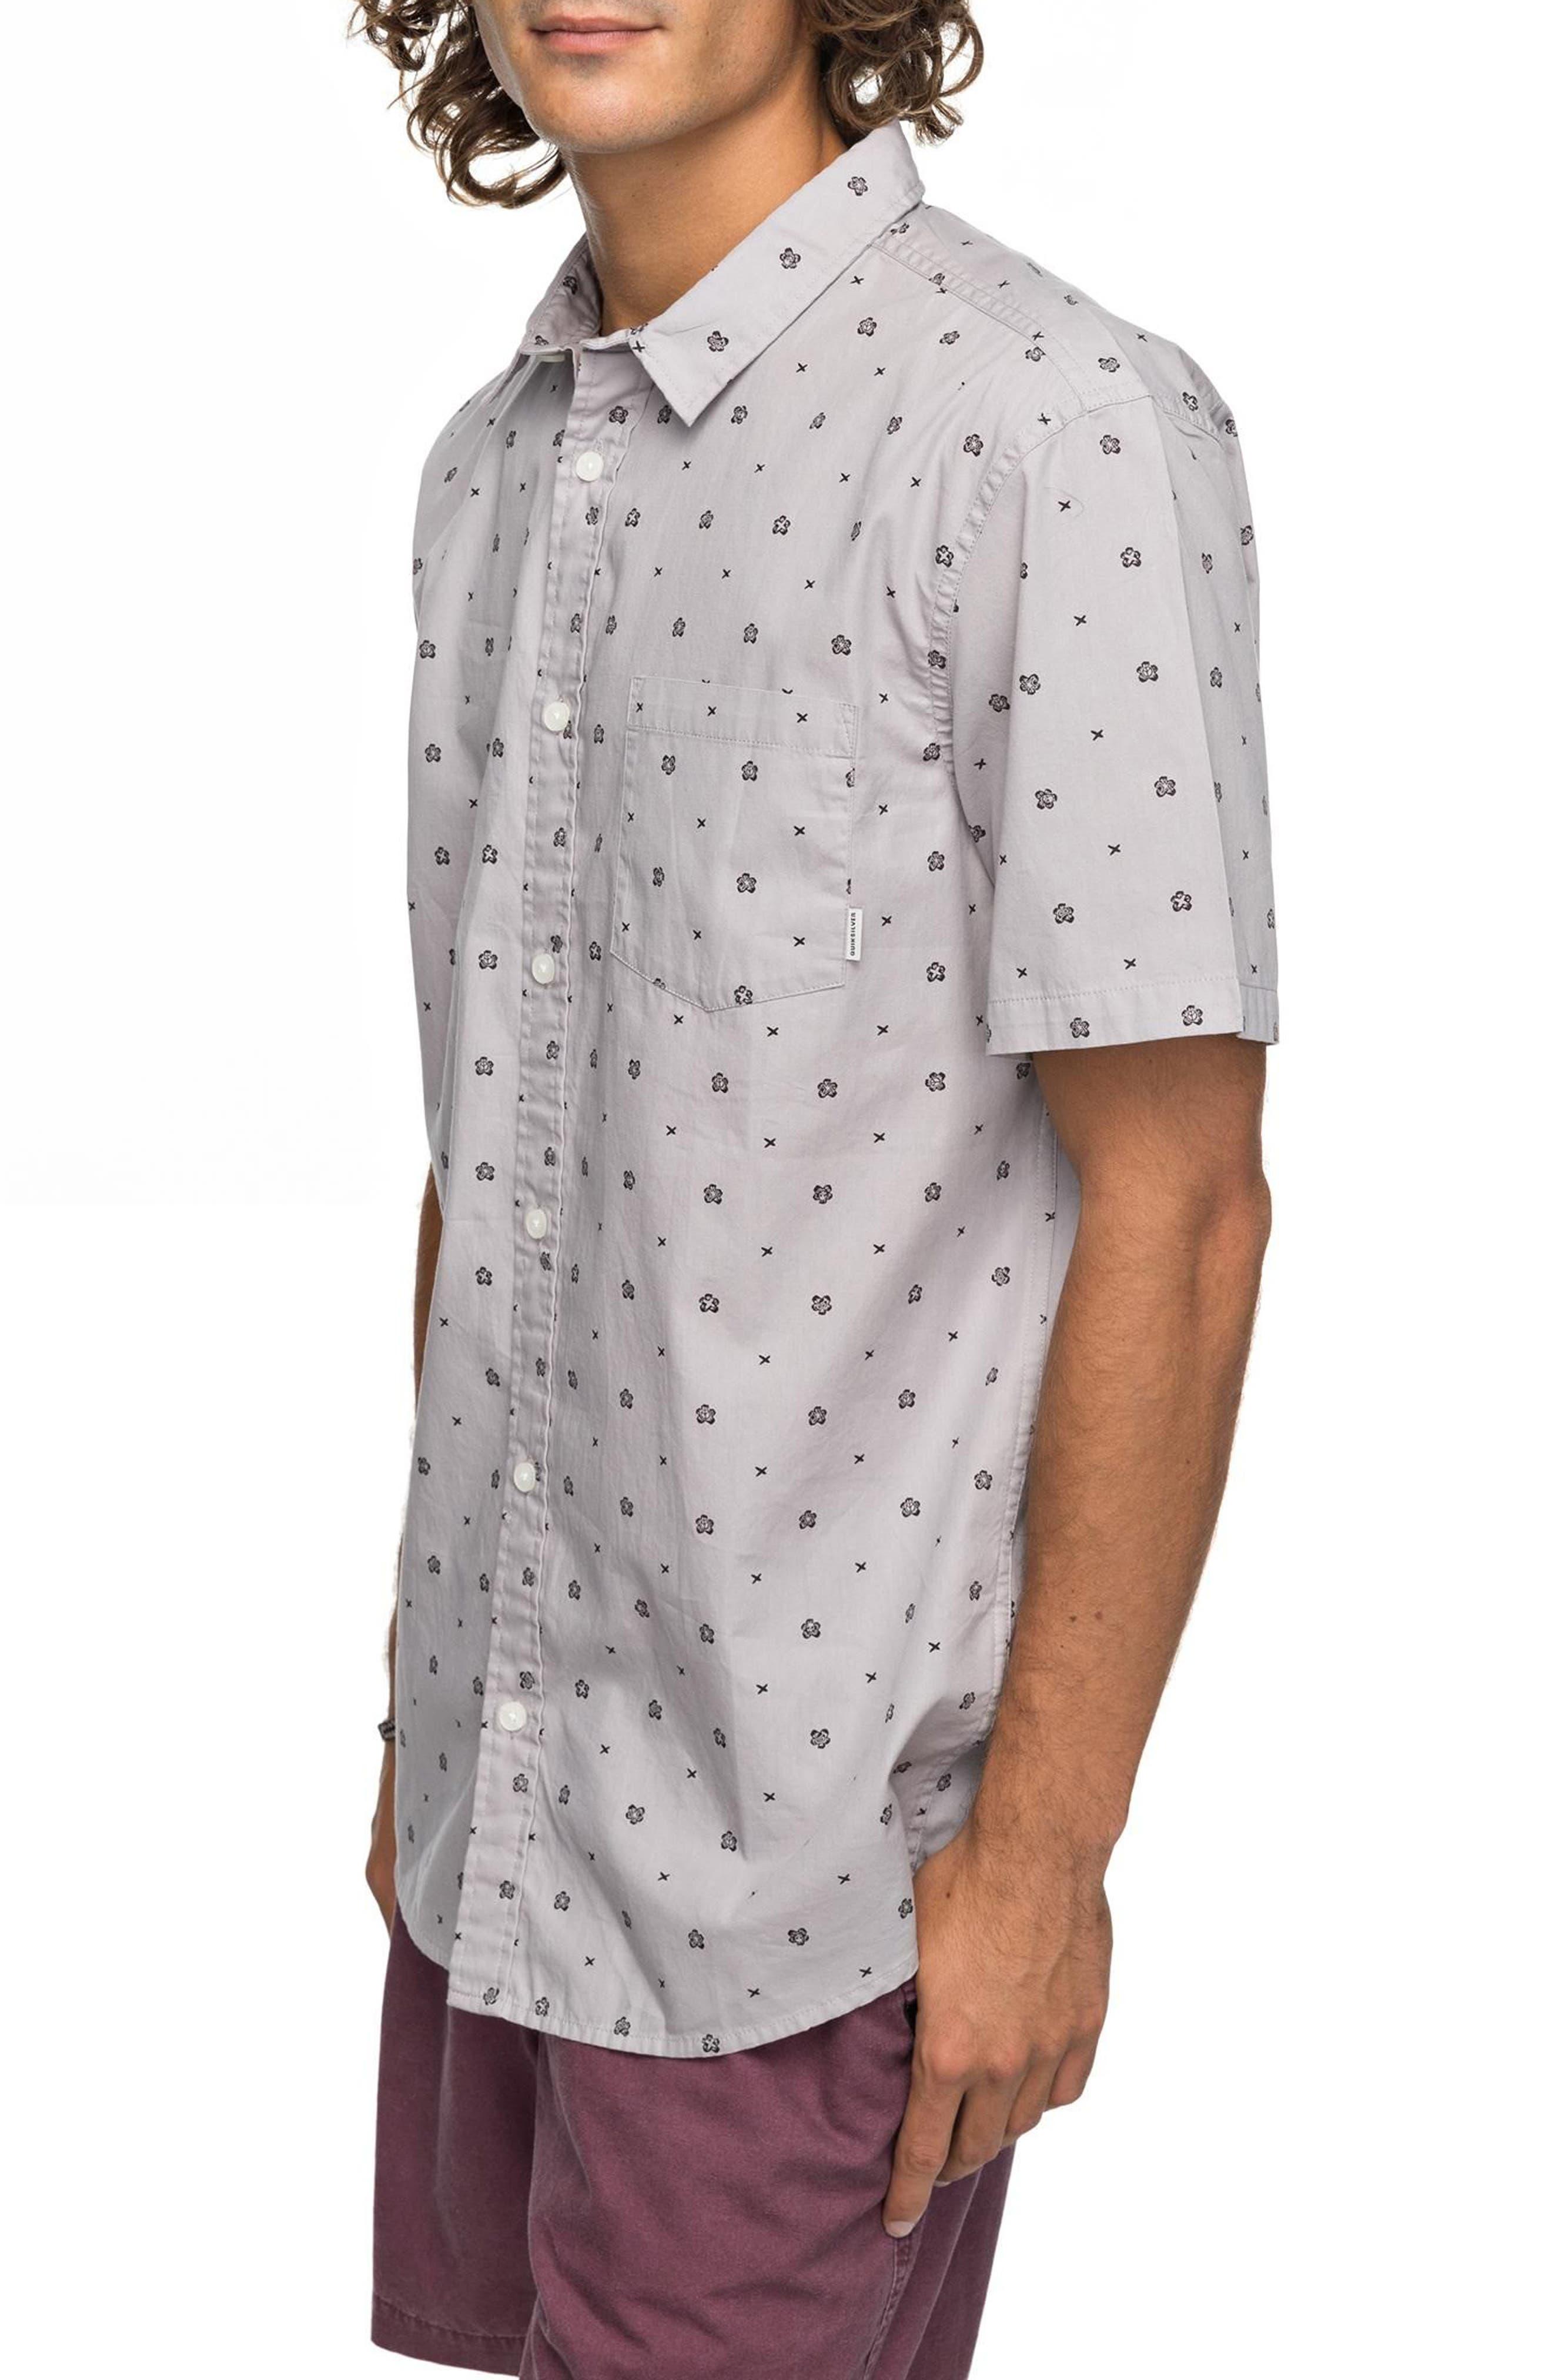 Kamanoa Short Sleeve Shirt,                             Main thumbnail 1, color,                             Silver Sconce